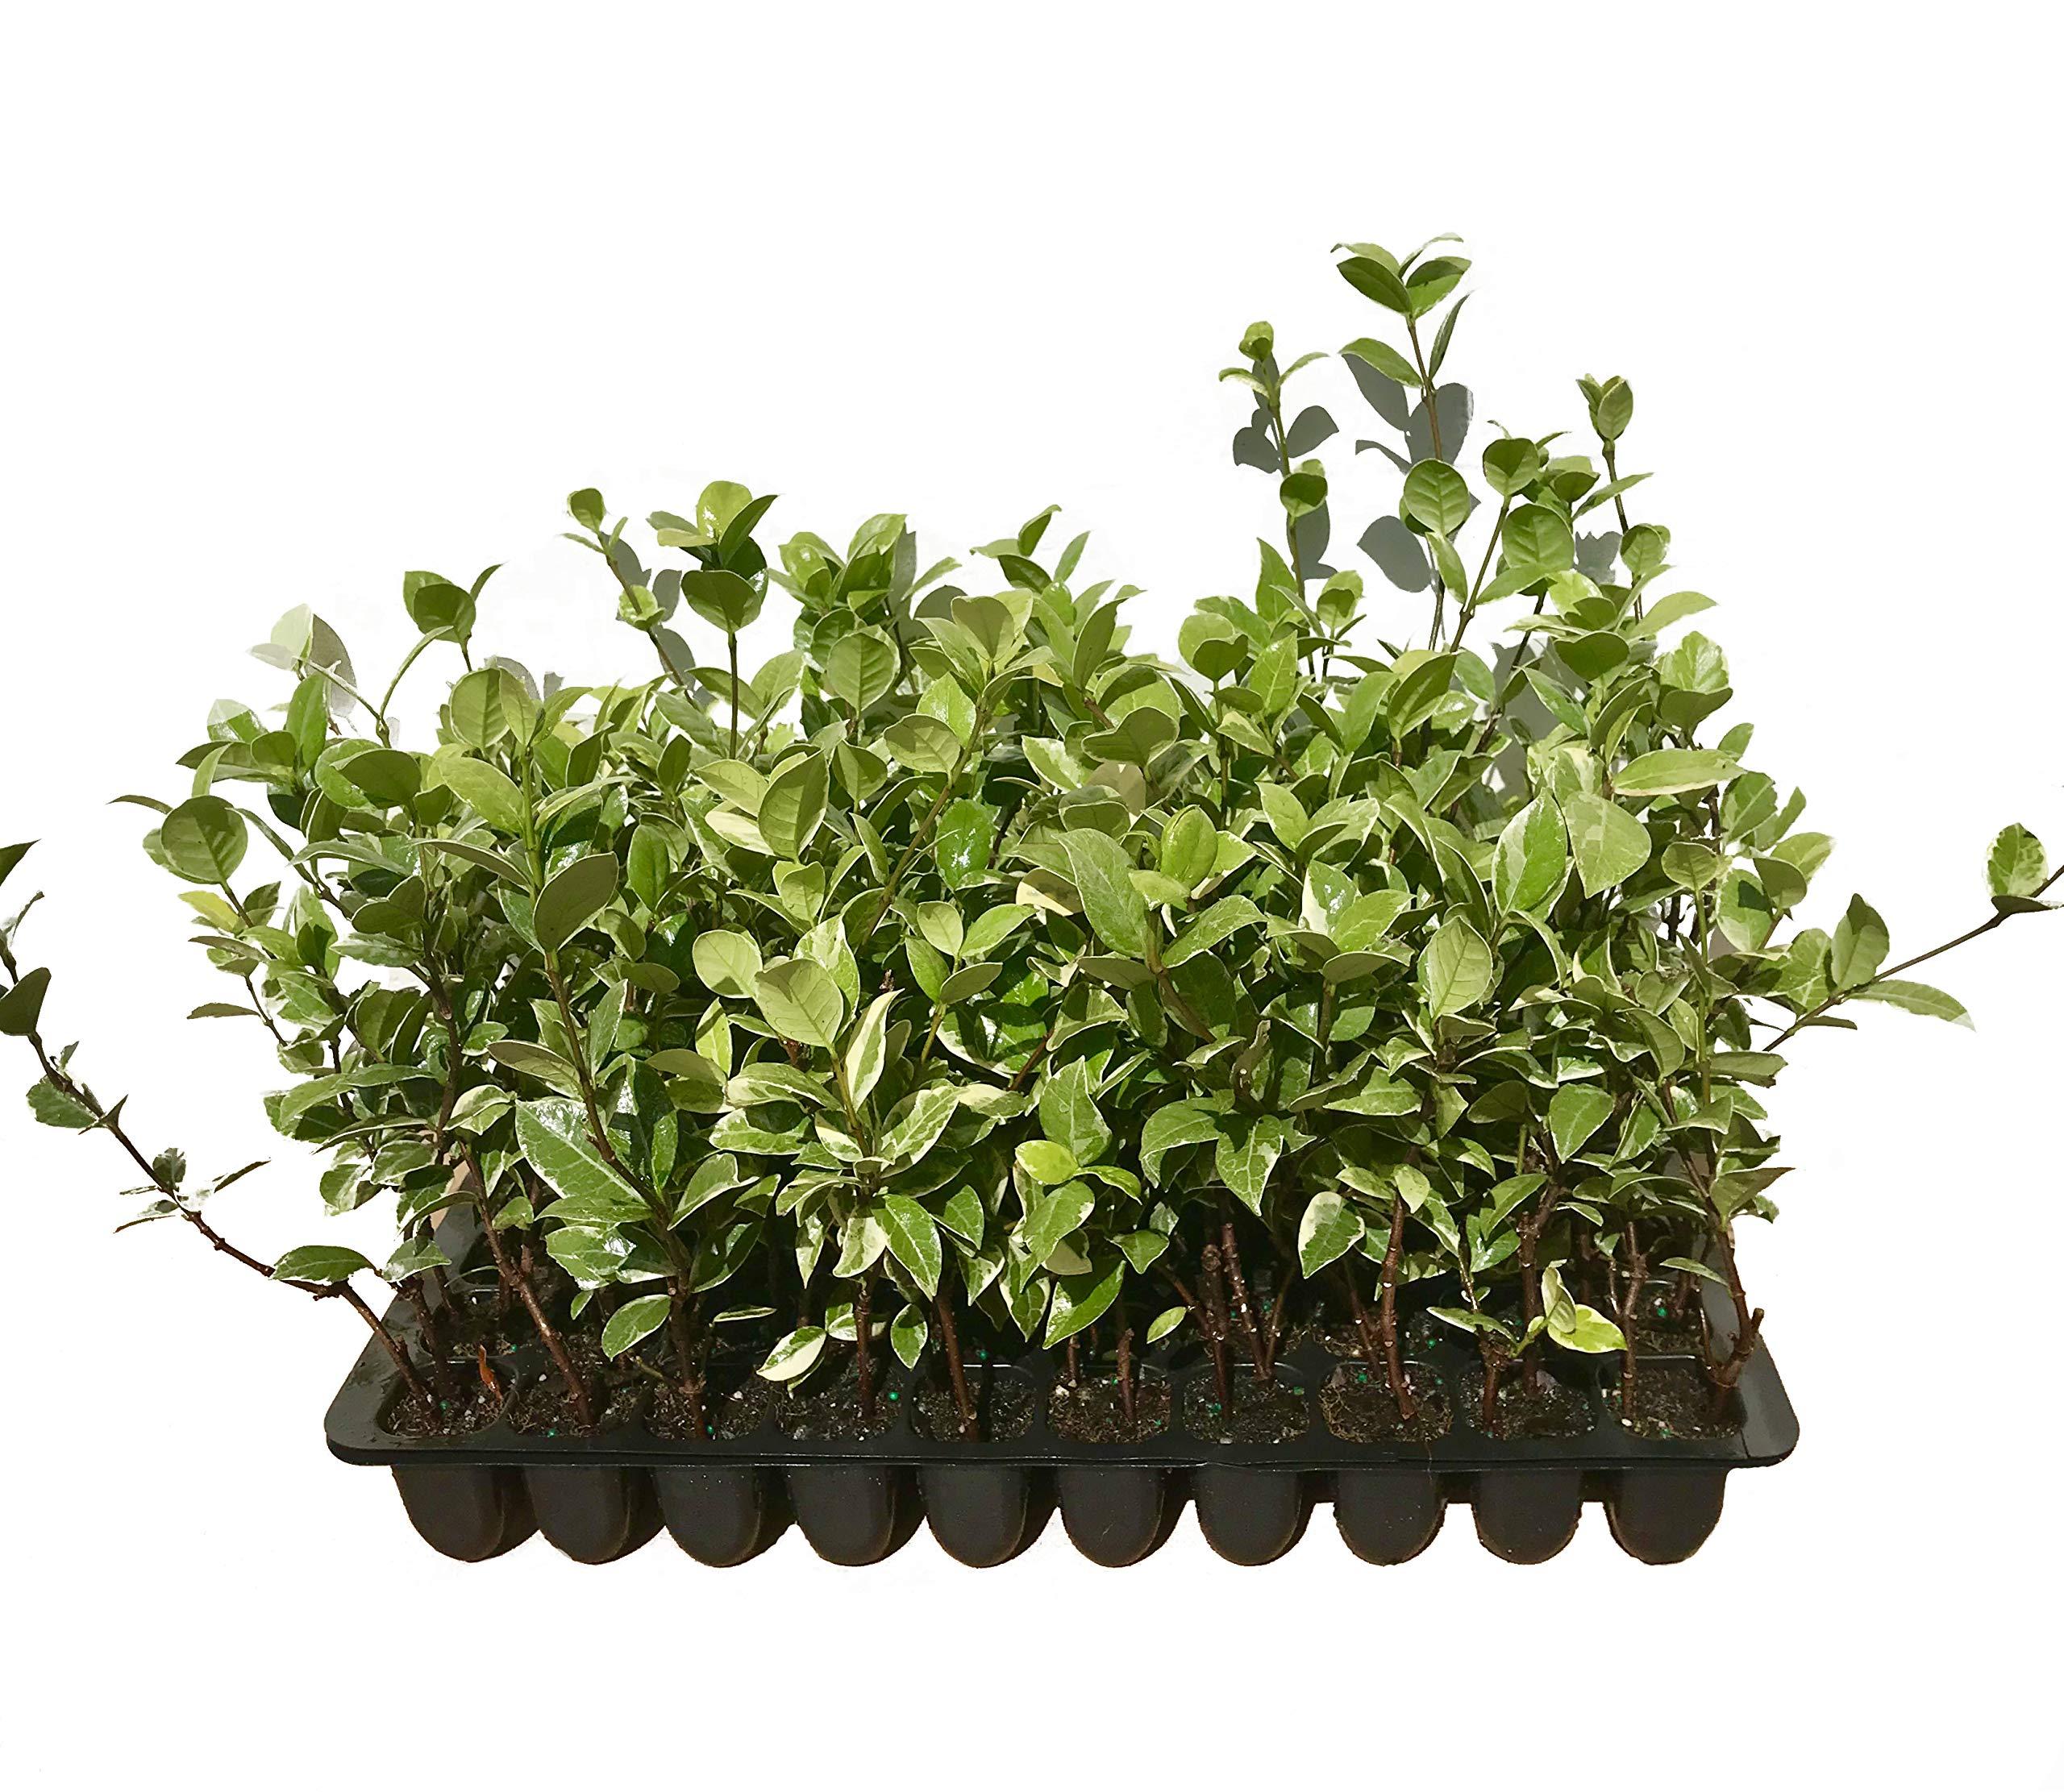 Confederate Jasmine Variegated - 60 Live Plants - Trachelospermum Jasminoides Variegatum - Fragrant Blooming Evergreen Vine by Florida Foliage (Image #1)